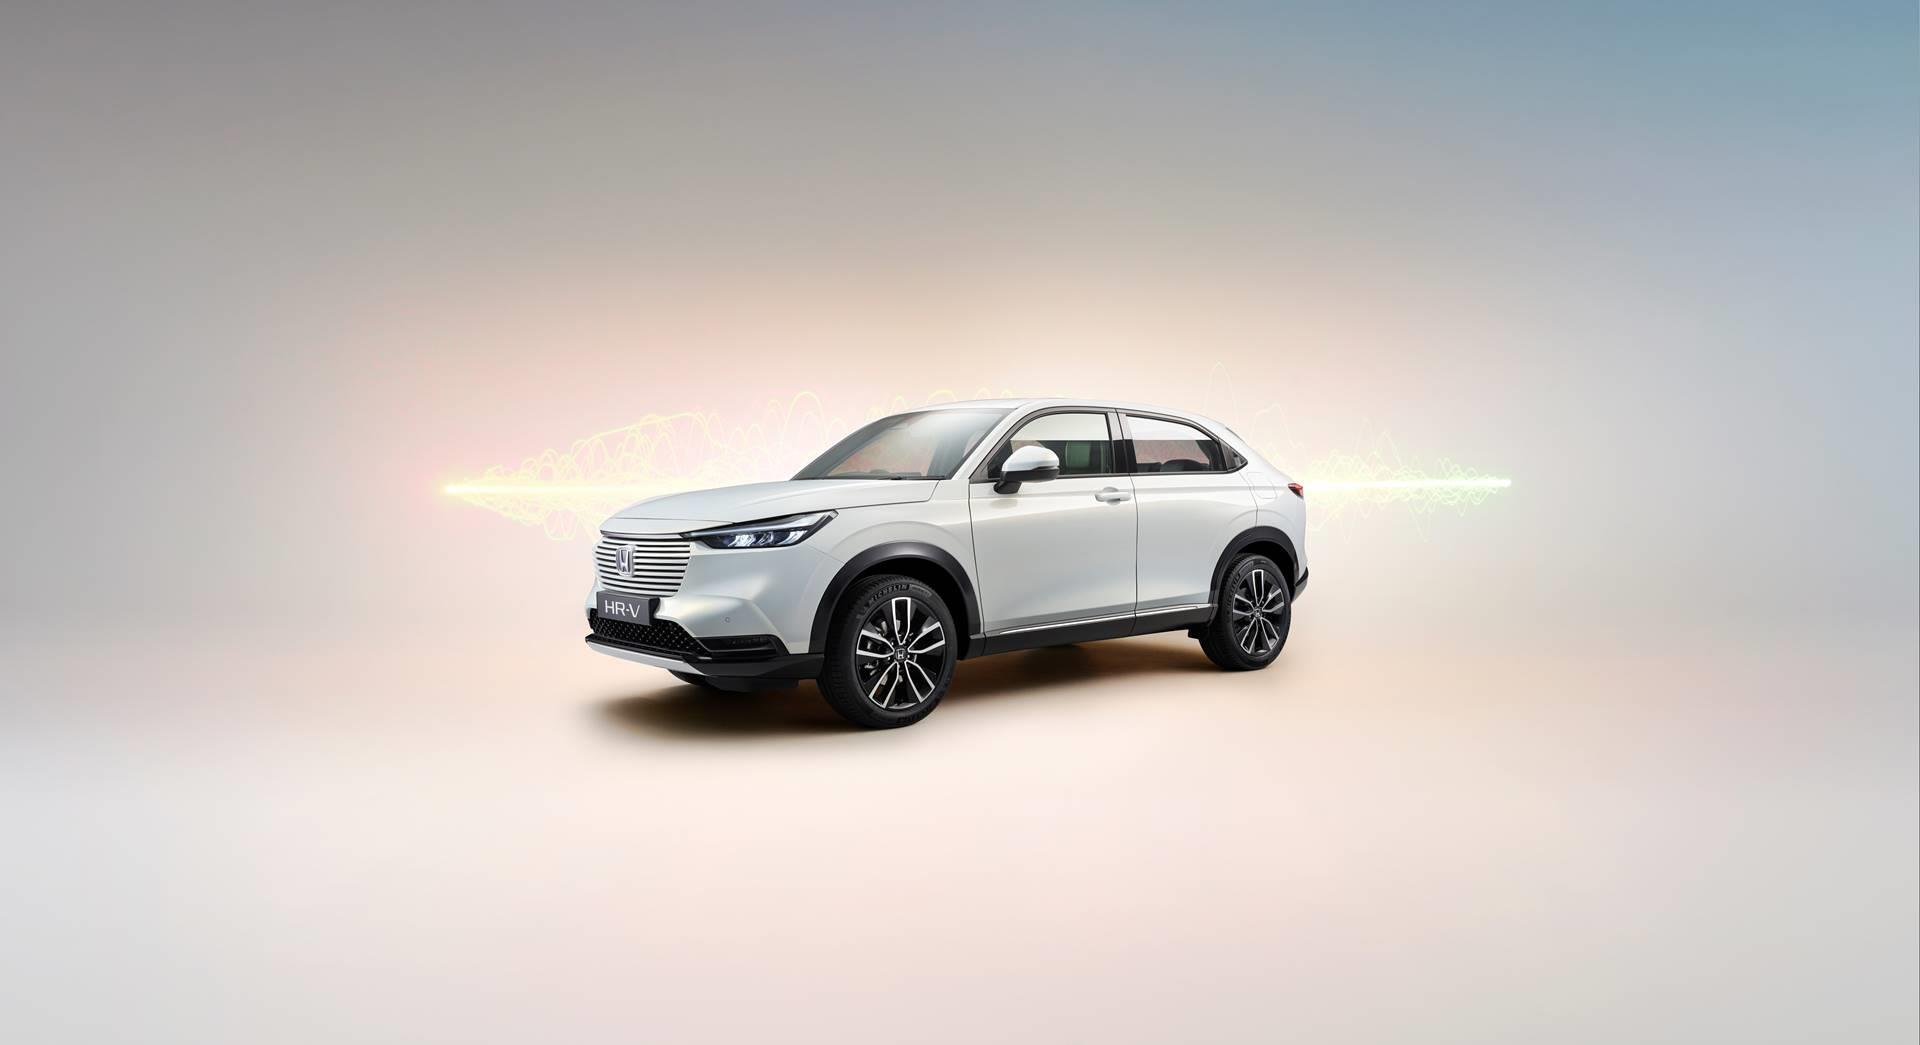 2022 Honda HR-V e:HEV